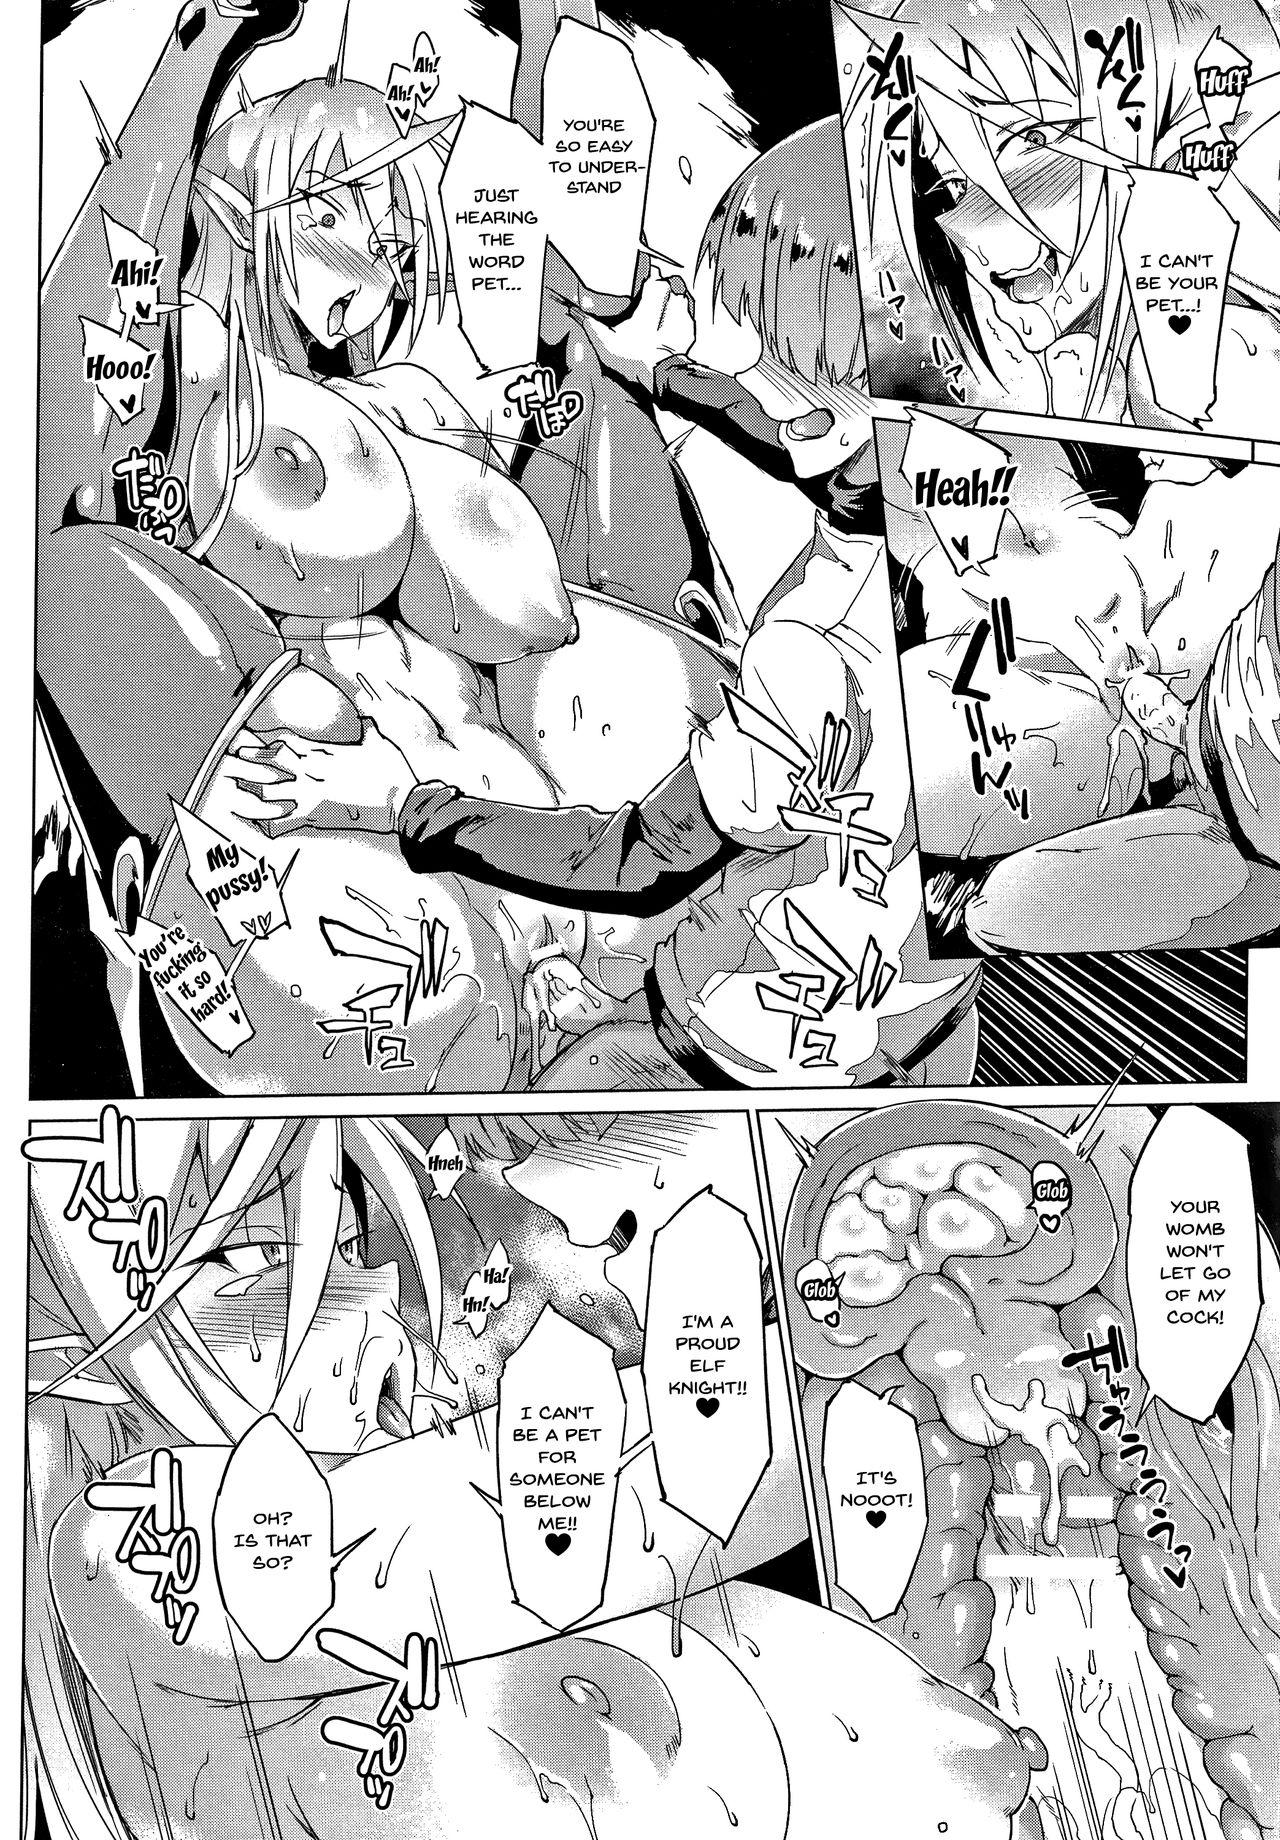 [Fan no Hitori] Sennen Reijou ~ My Lady, My Master ~  Ch.1-3 [English] {Doujins.com} 26